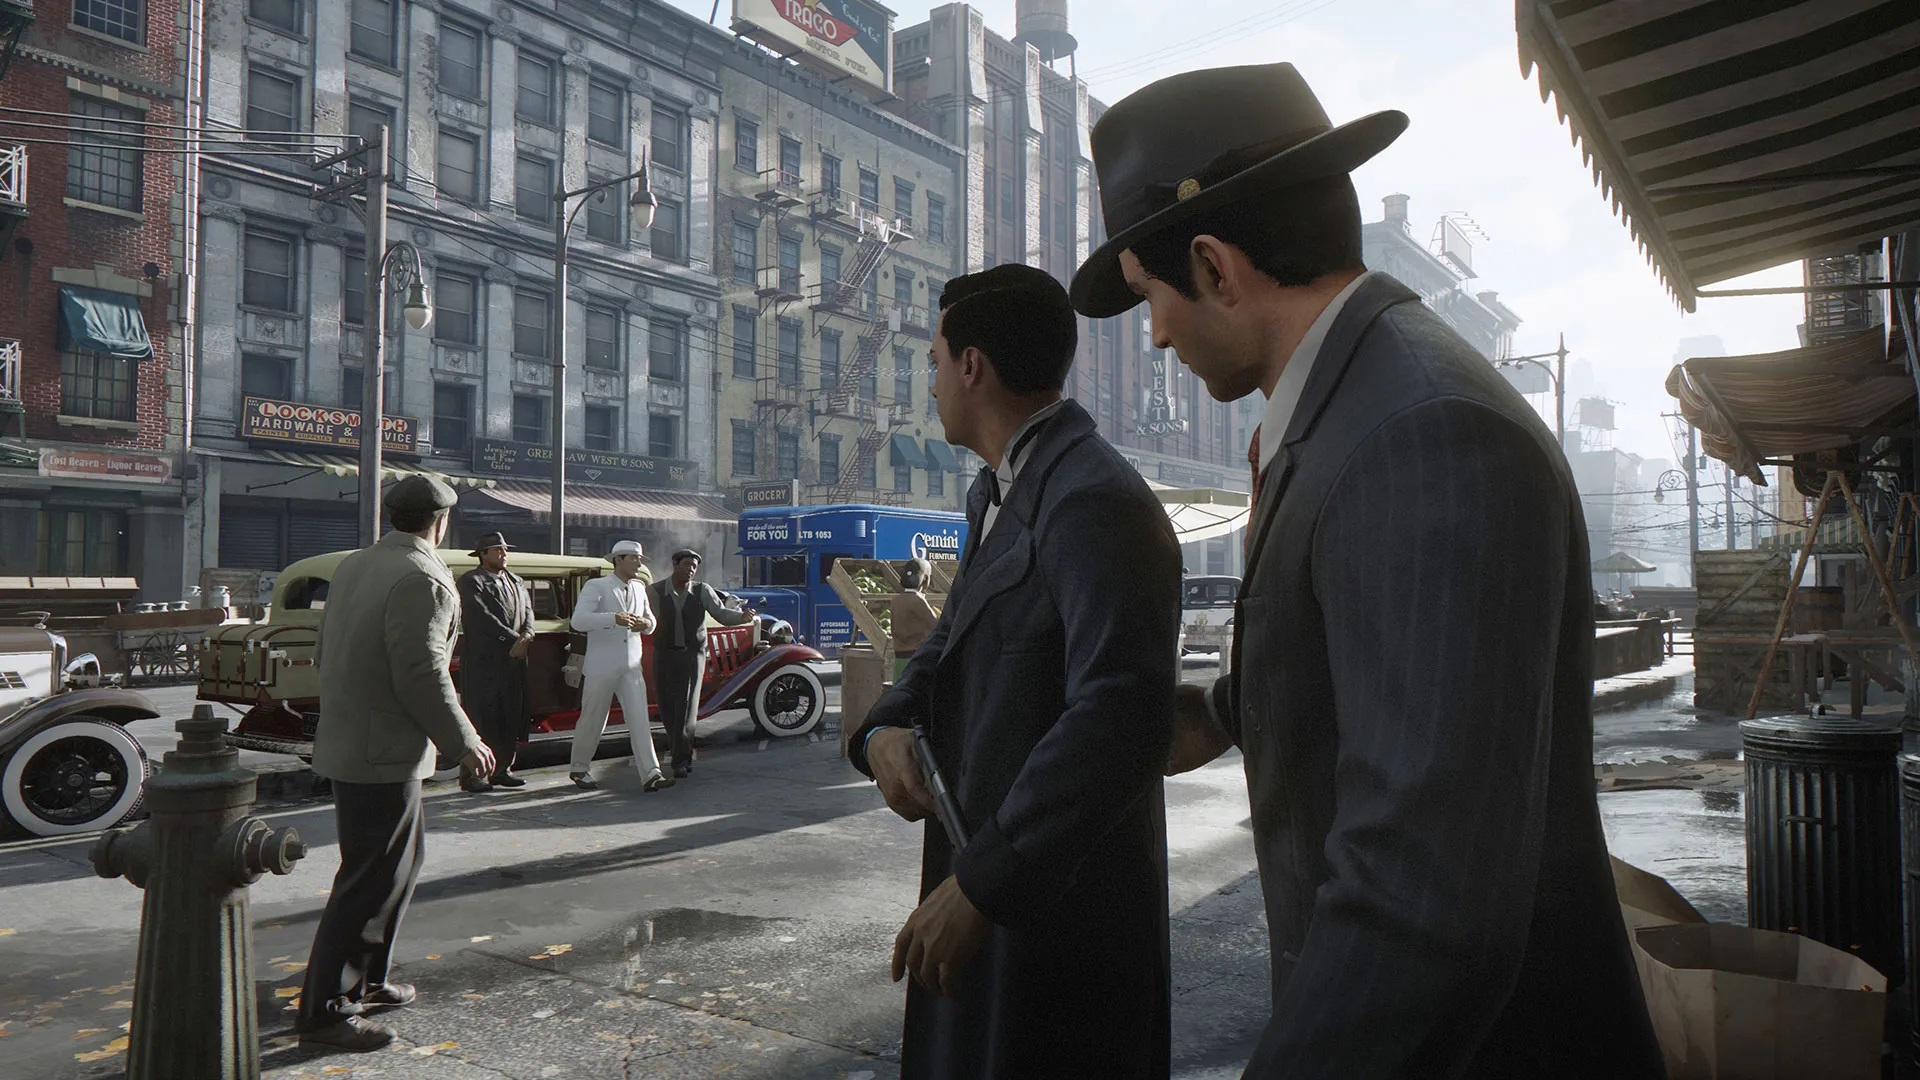 Mafia: Definitive Edition has a great callback to Mafia III's kinkiest moment screenshot